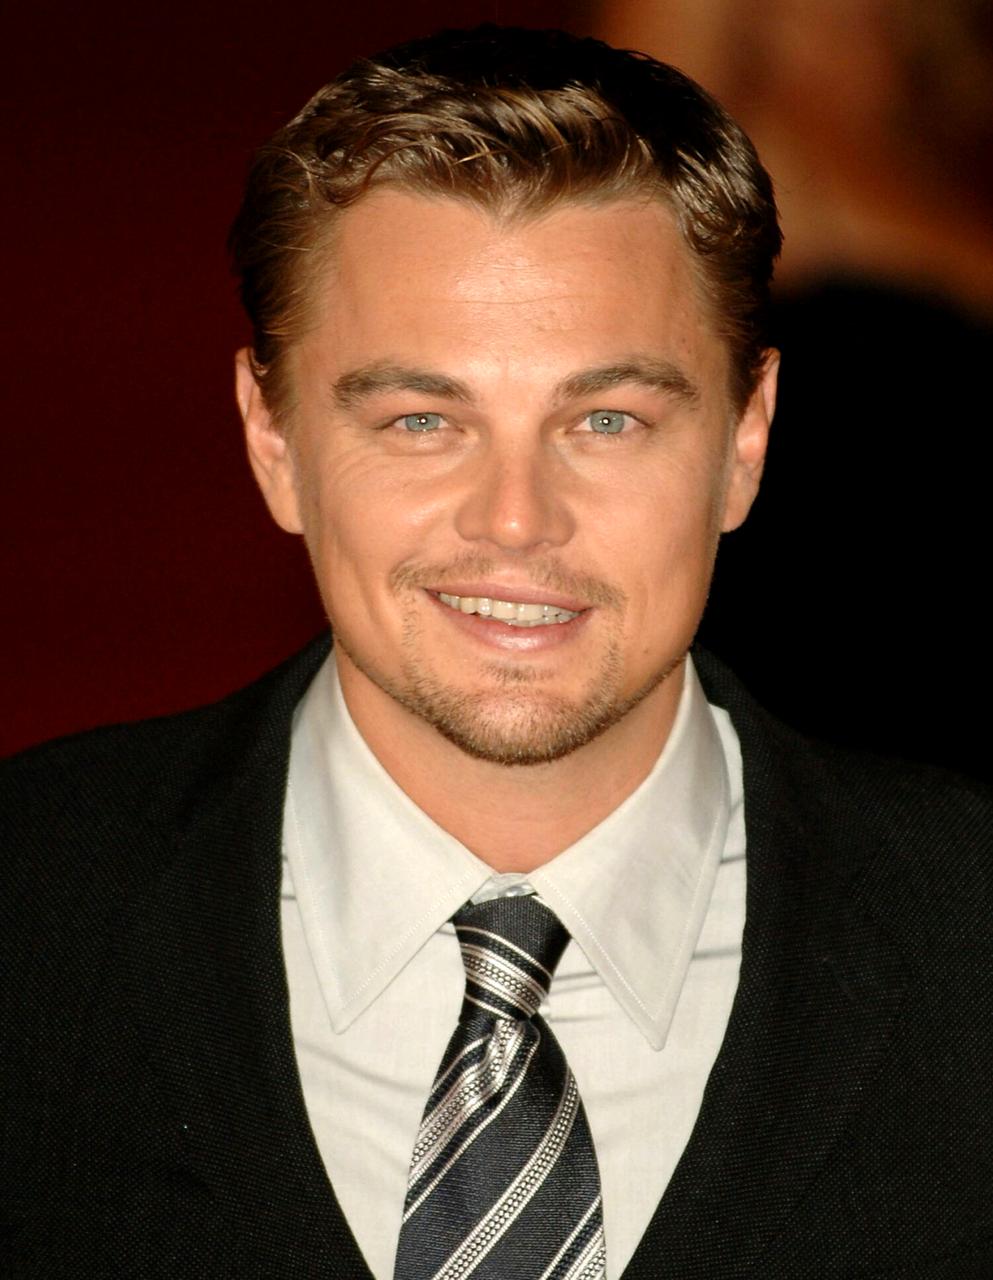 Leo Crooked Smile   Young leonardo dicaprio, Leonardo dicapro, Leo dicaprio